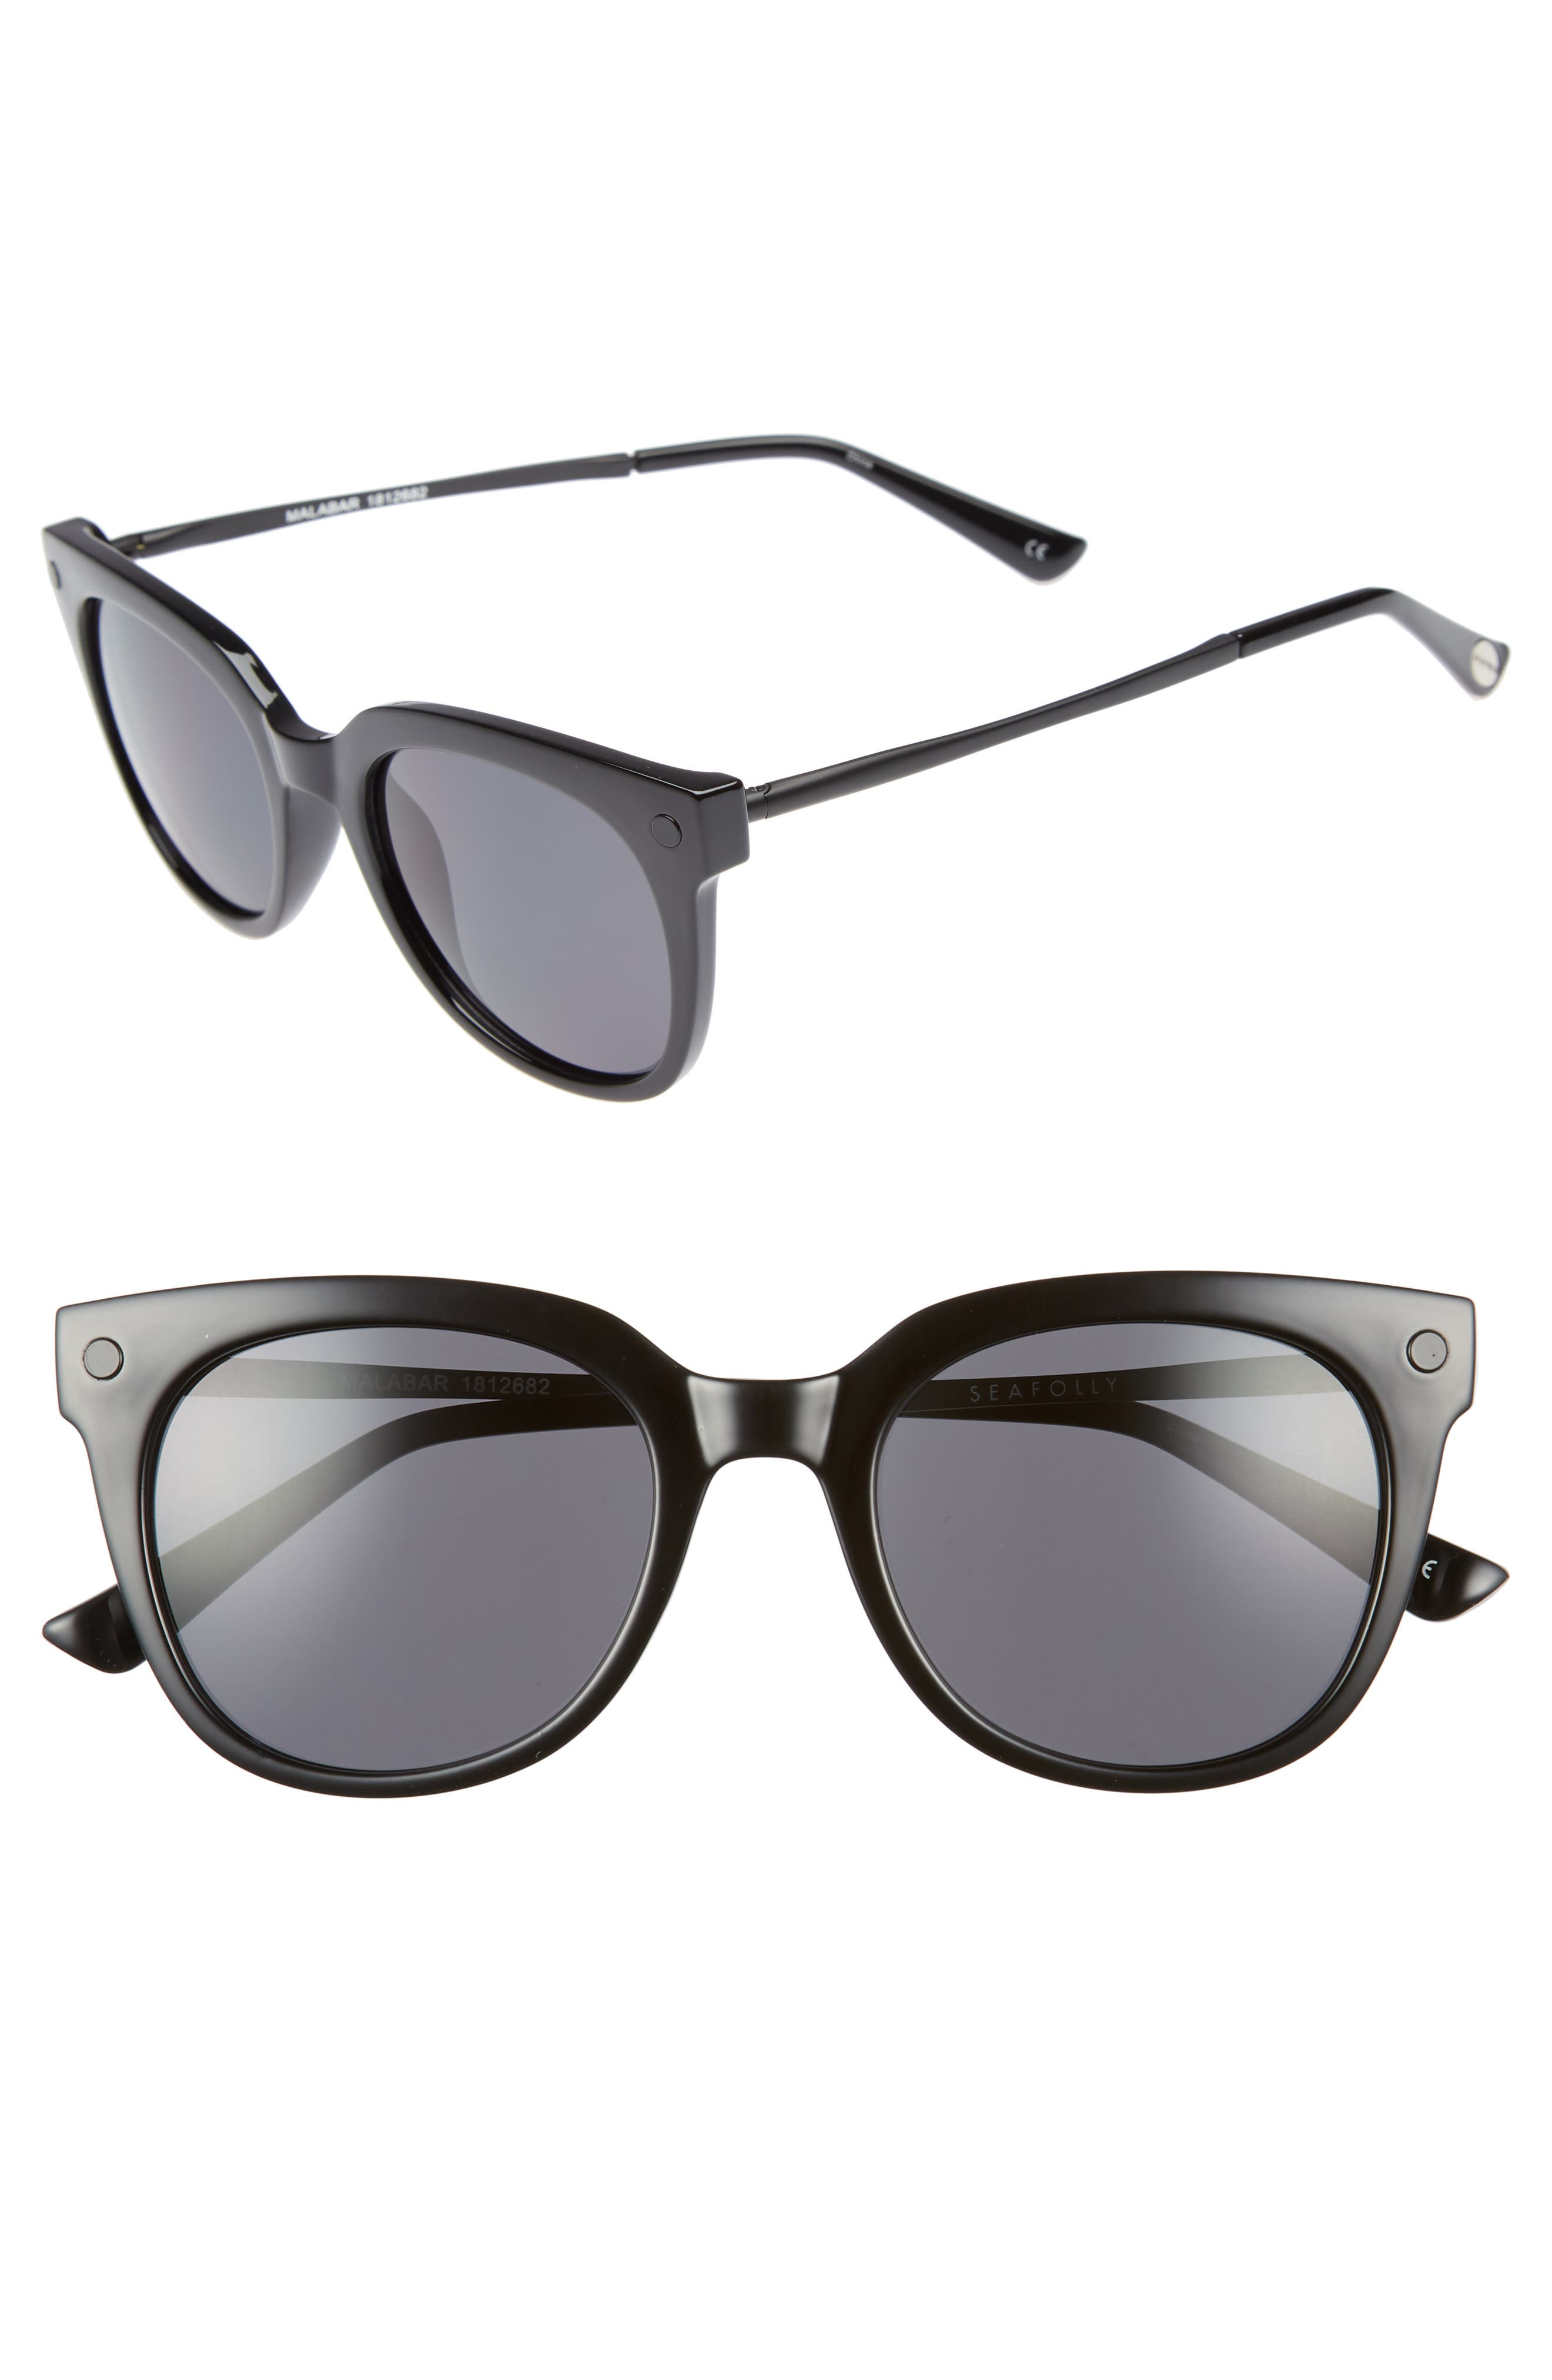 Malabar 52mm Sunglasses,                         Main,                         color, BLACK